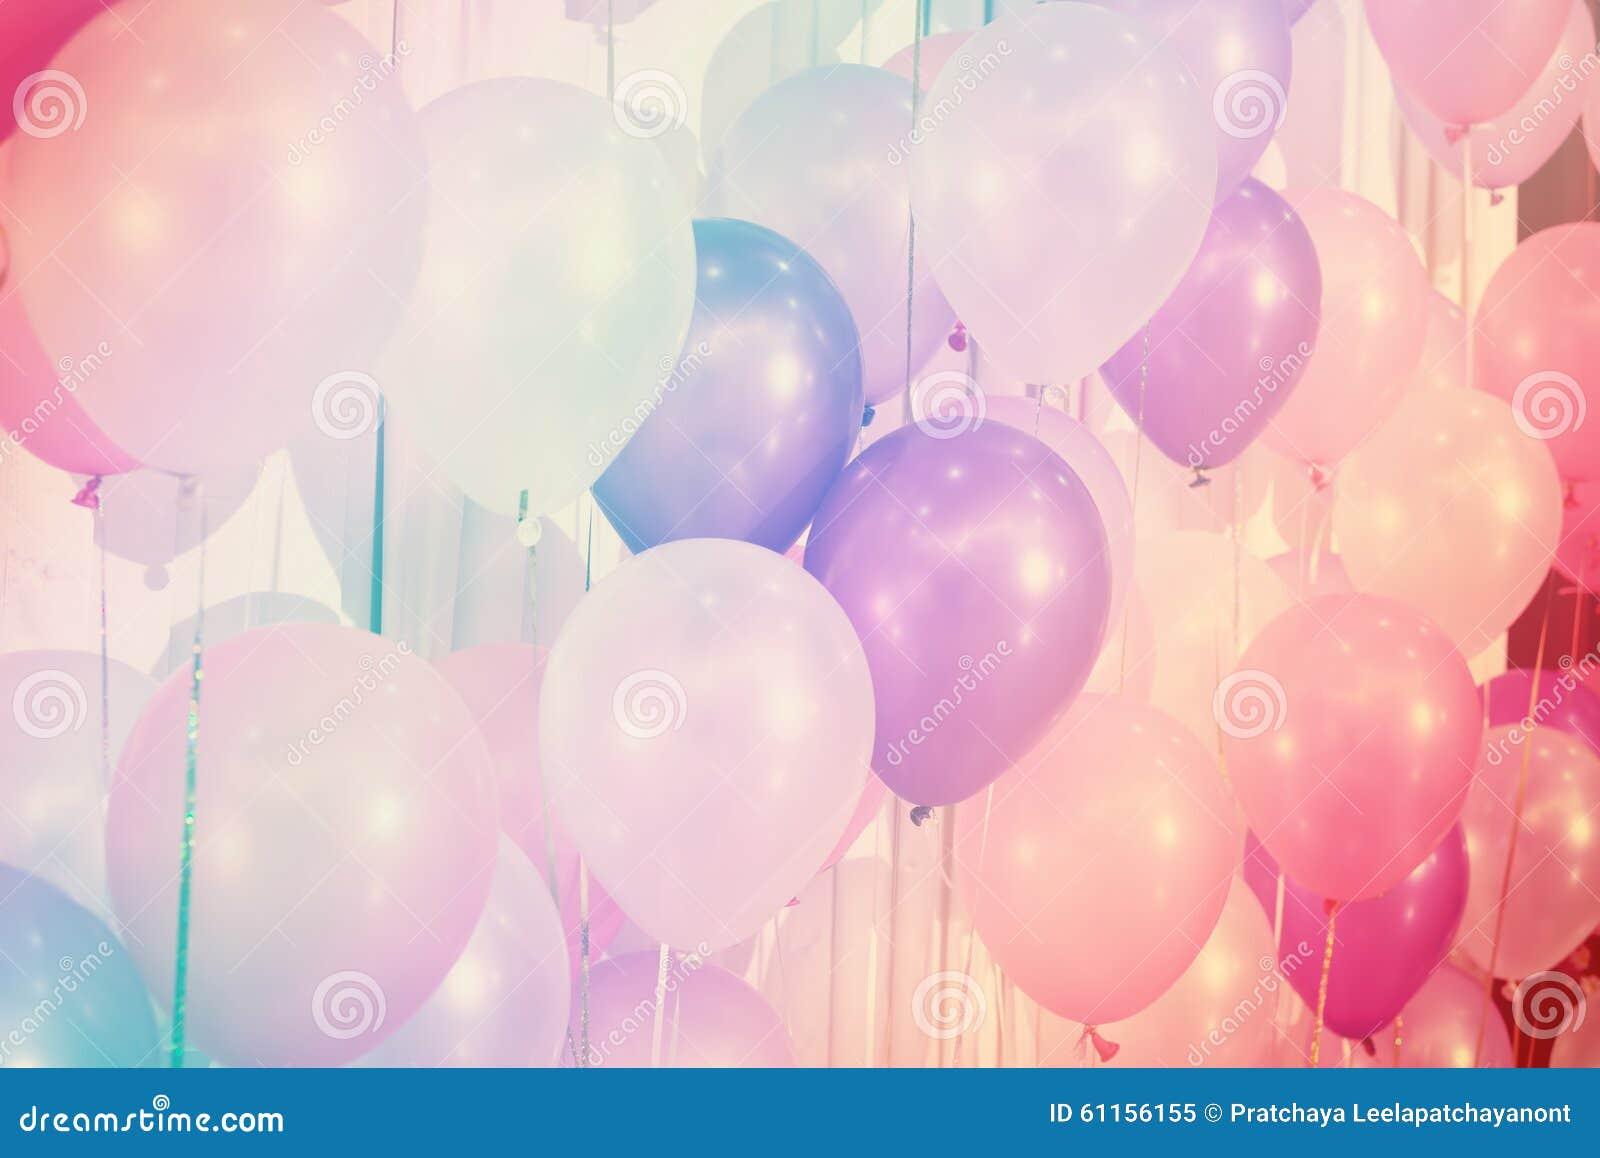 Pastelowego koloru balony